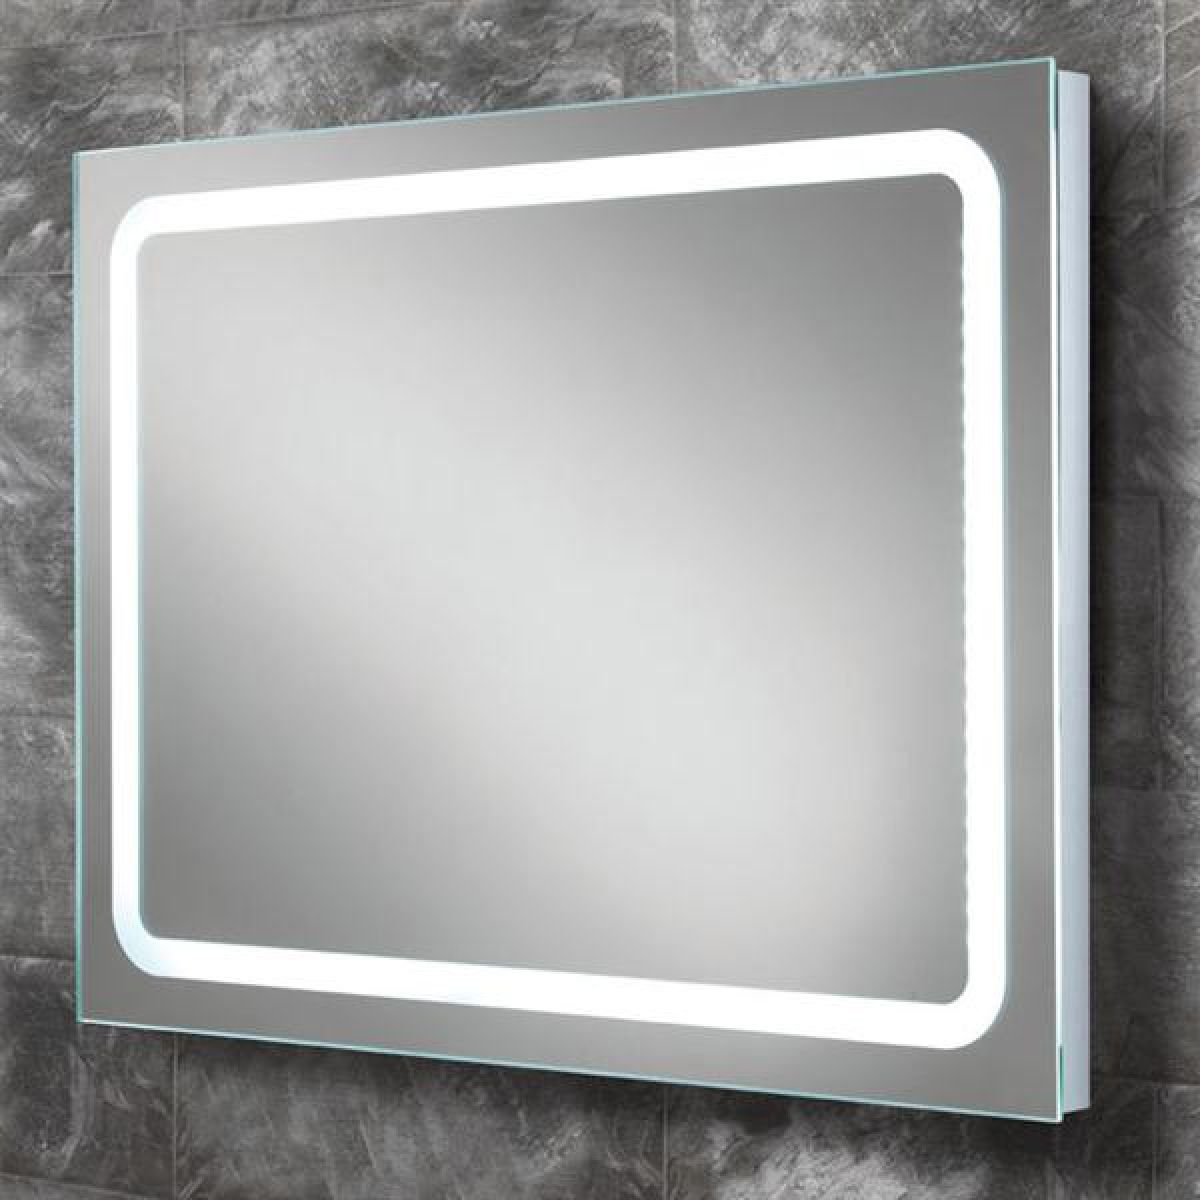 HiB Scarlet LED Back-Lit Bathroom Mirror